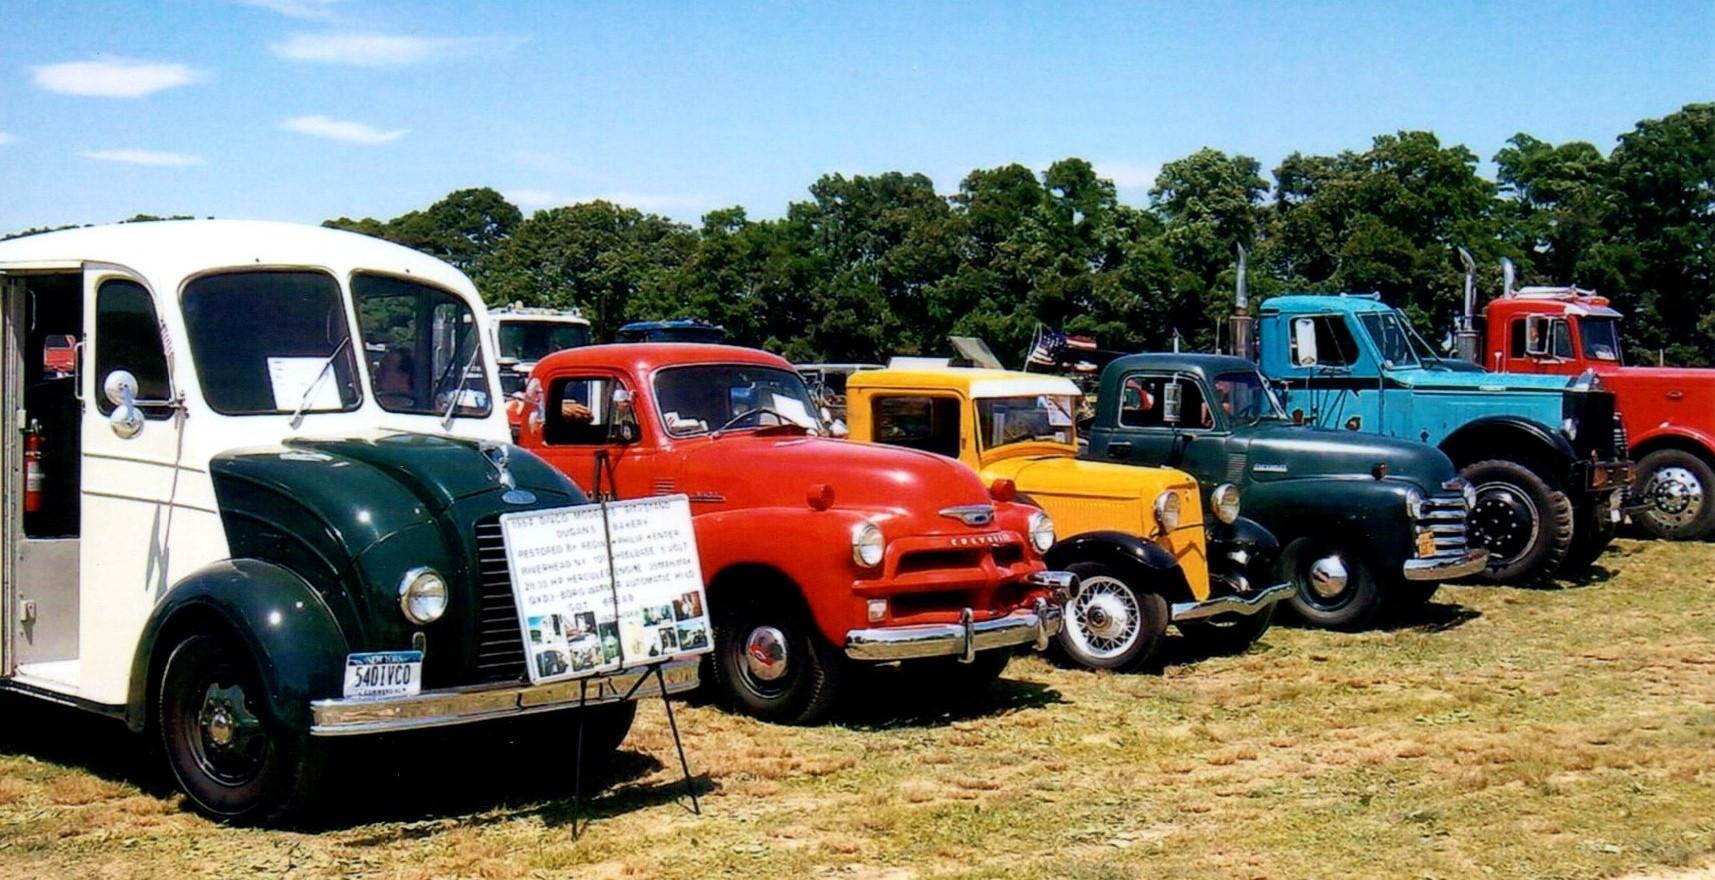 Trucks on the show field